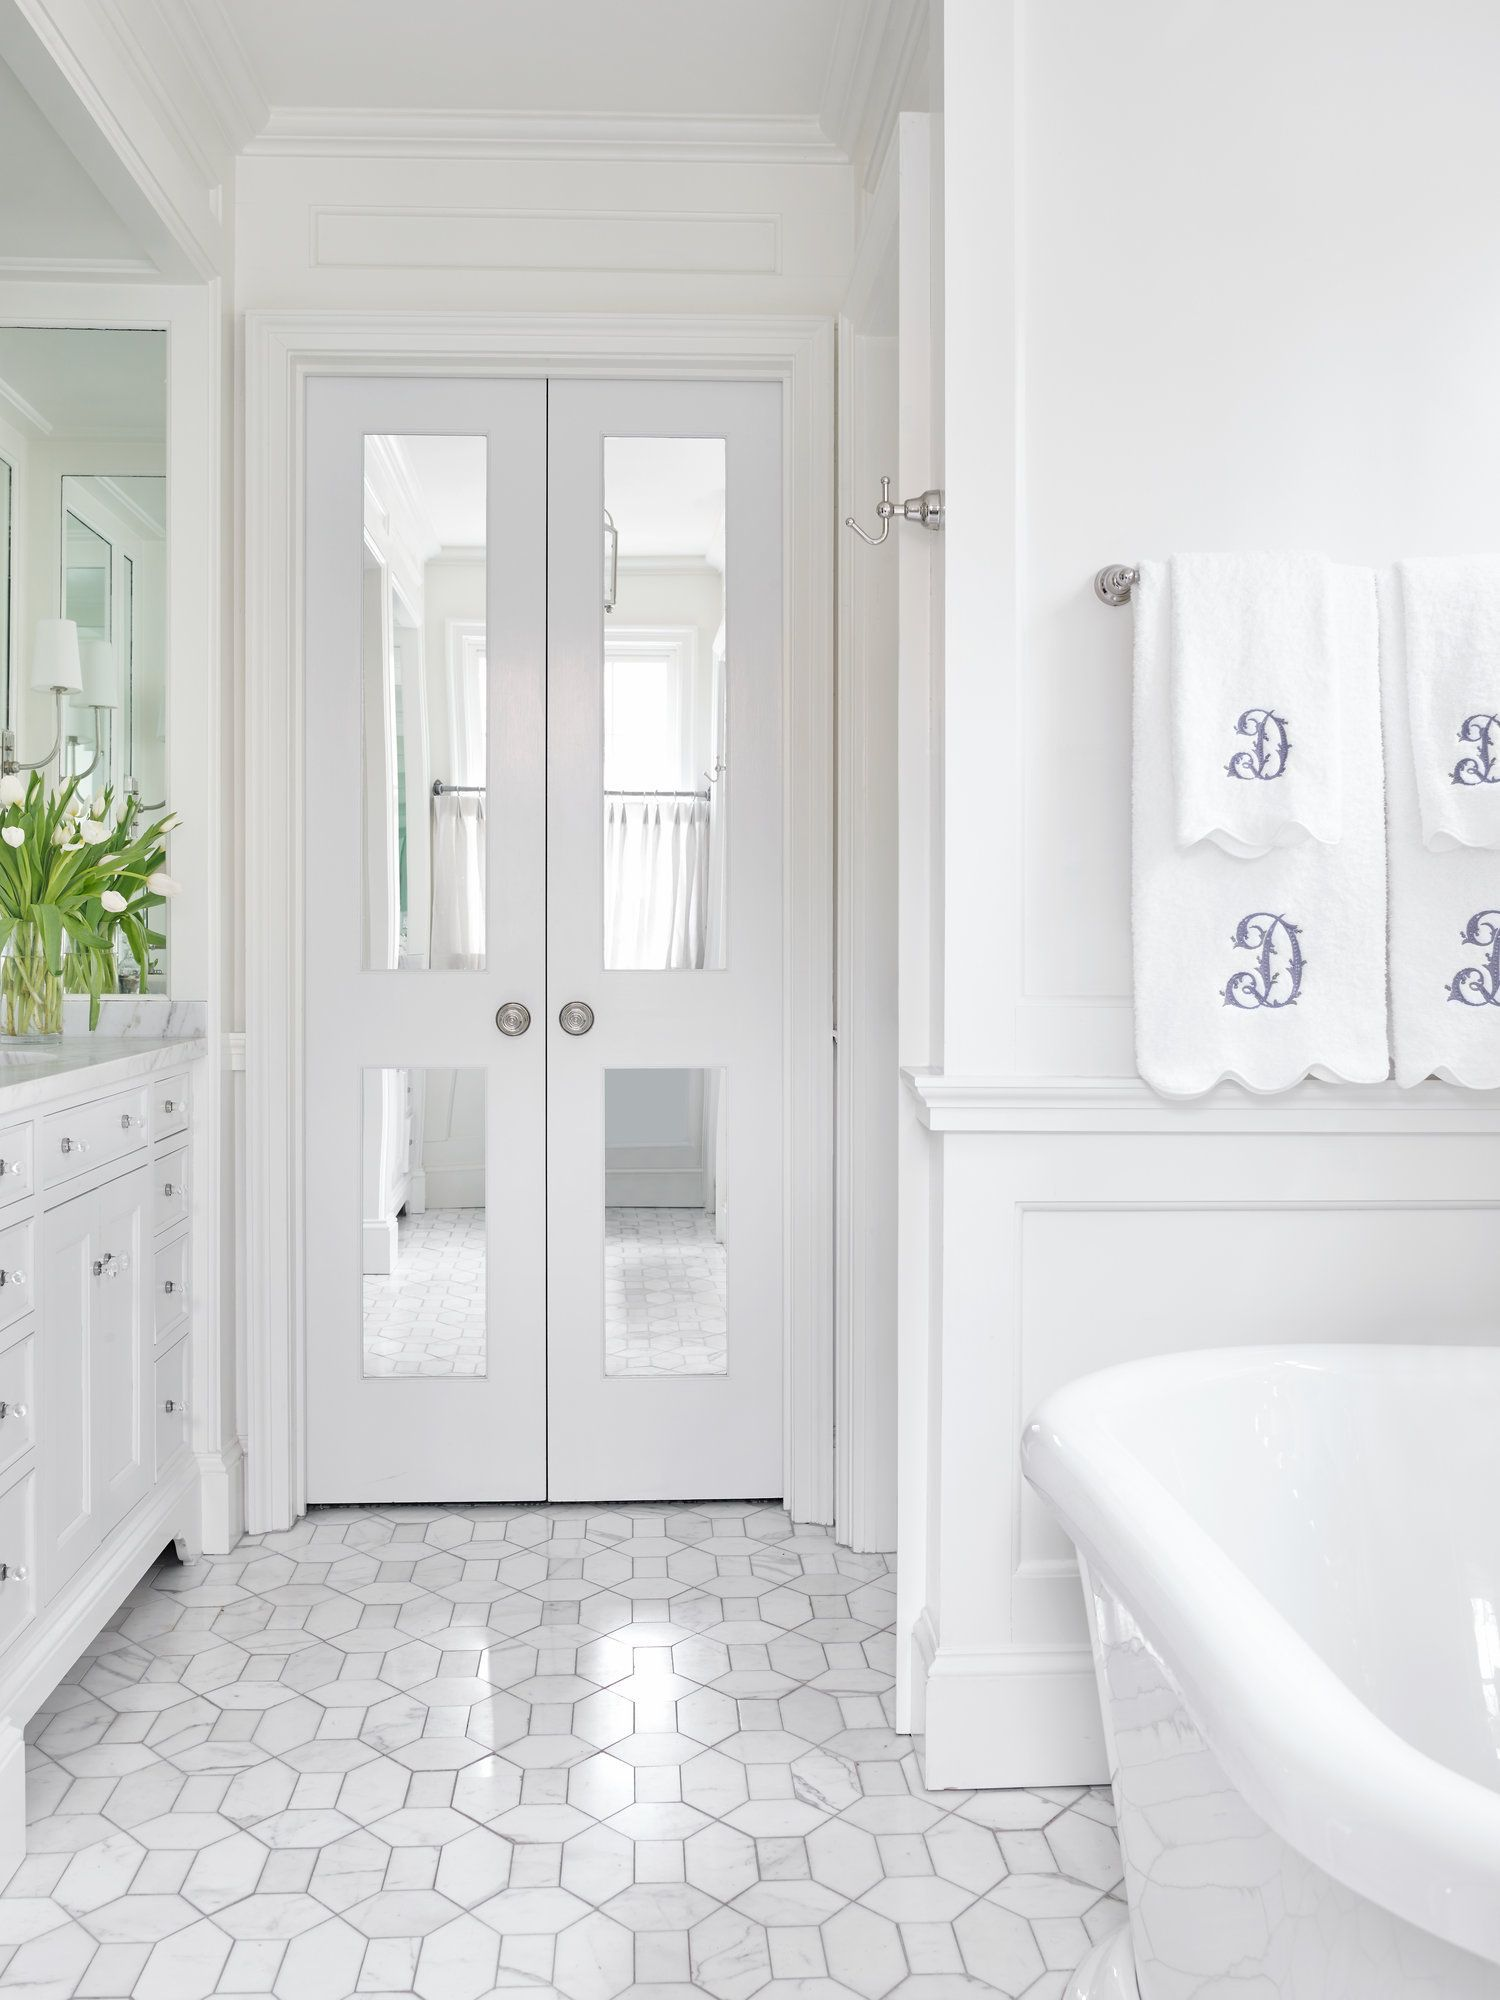 Bathroom Inspiration | White Bathrooms | Bathroom Design Ideas ...